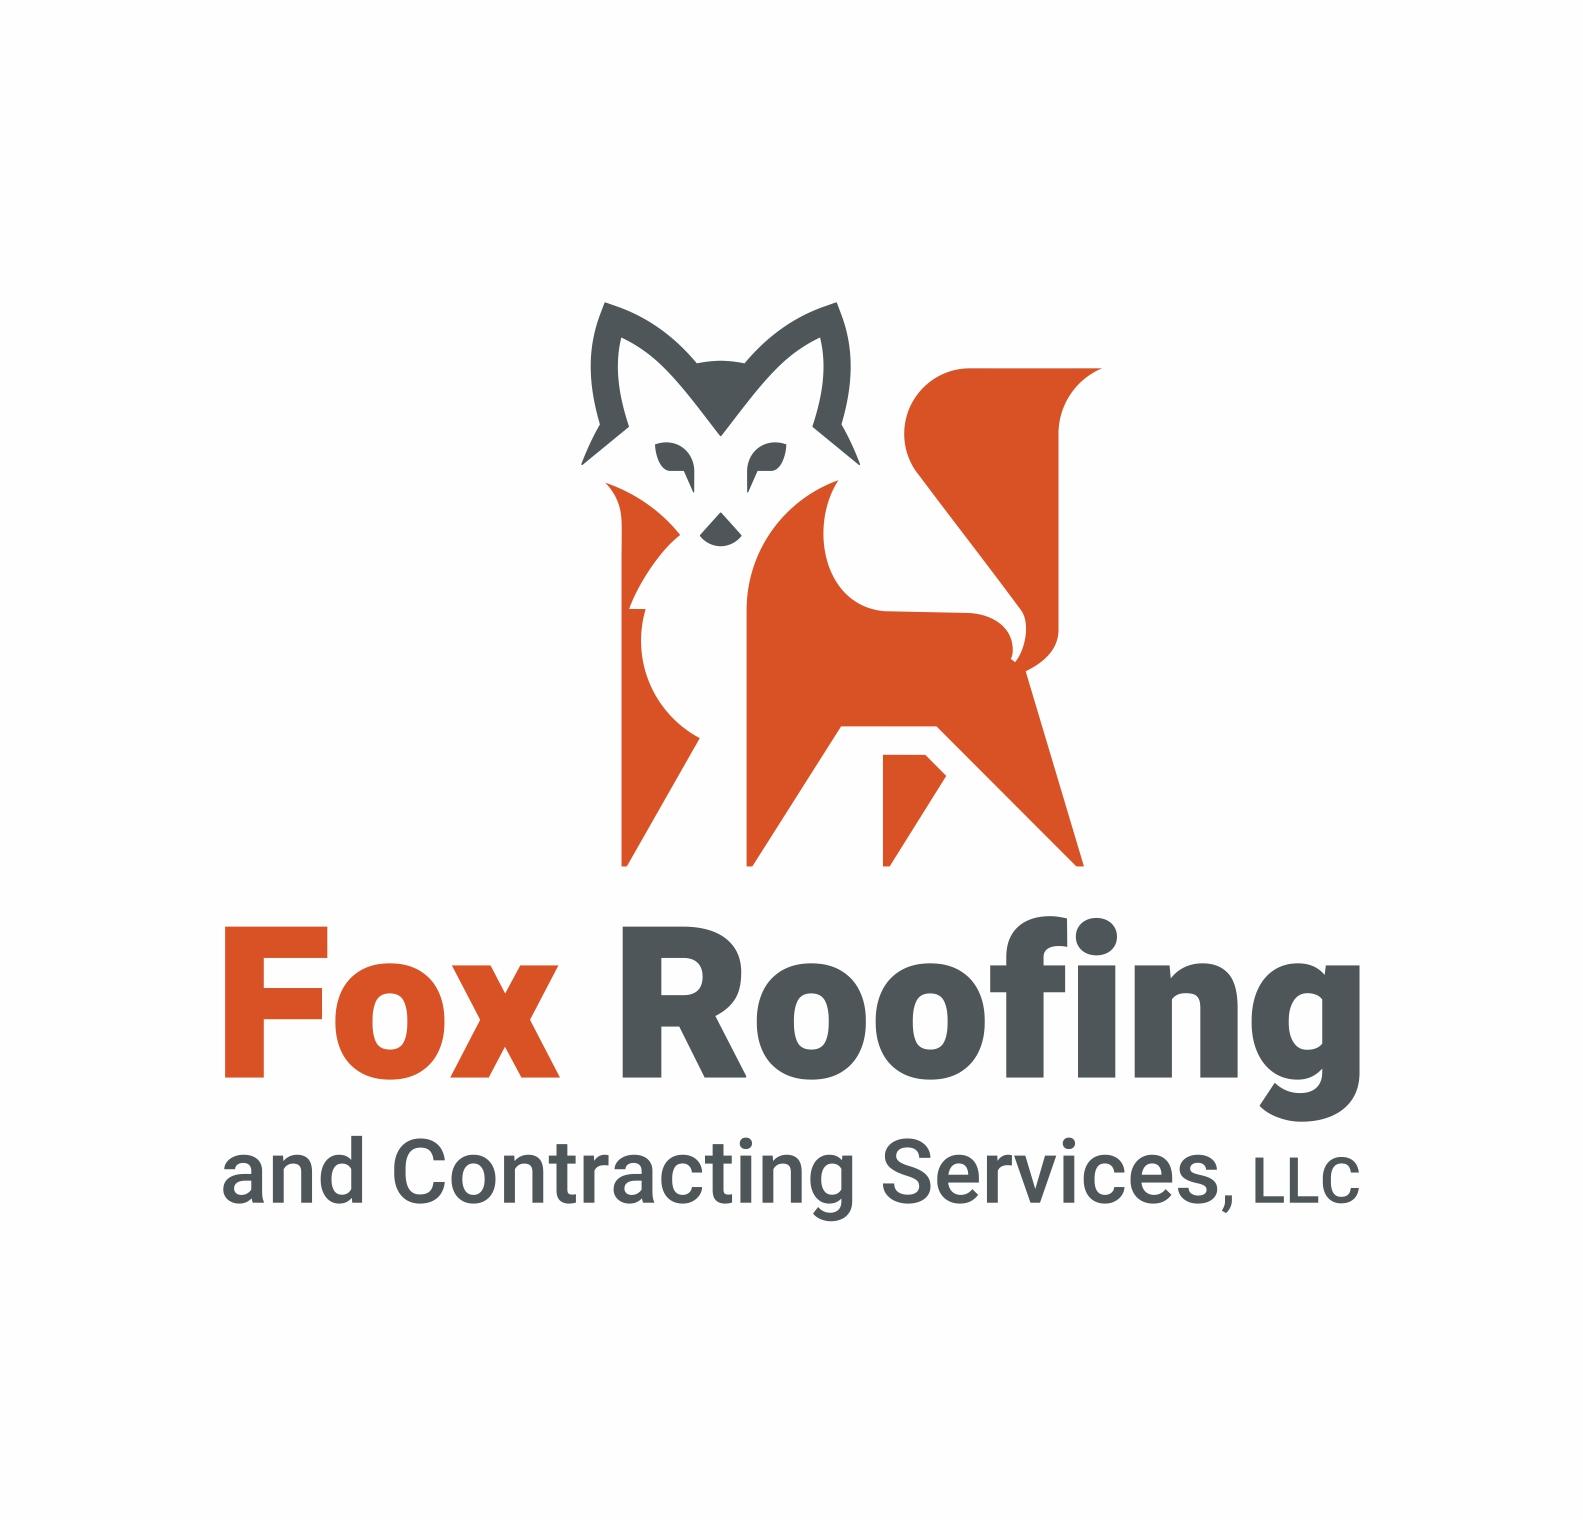 Cute fox logo.   Logotip s prikazom lisice.